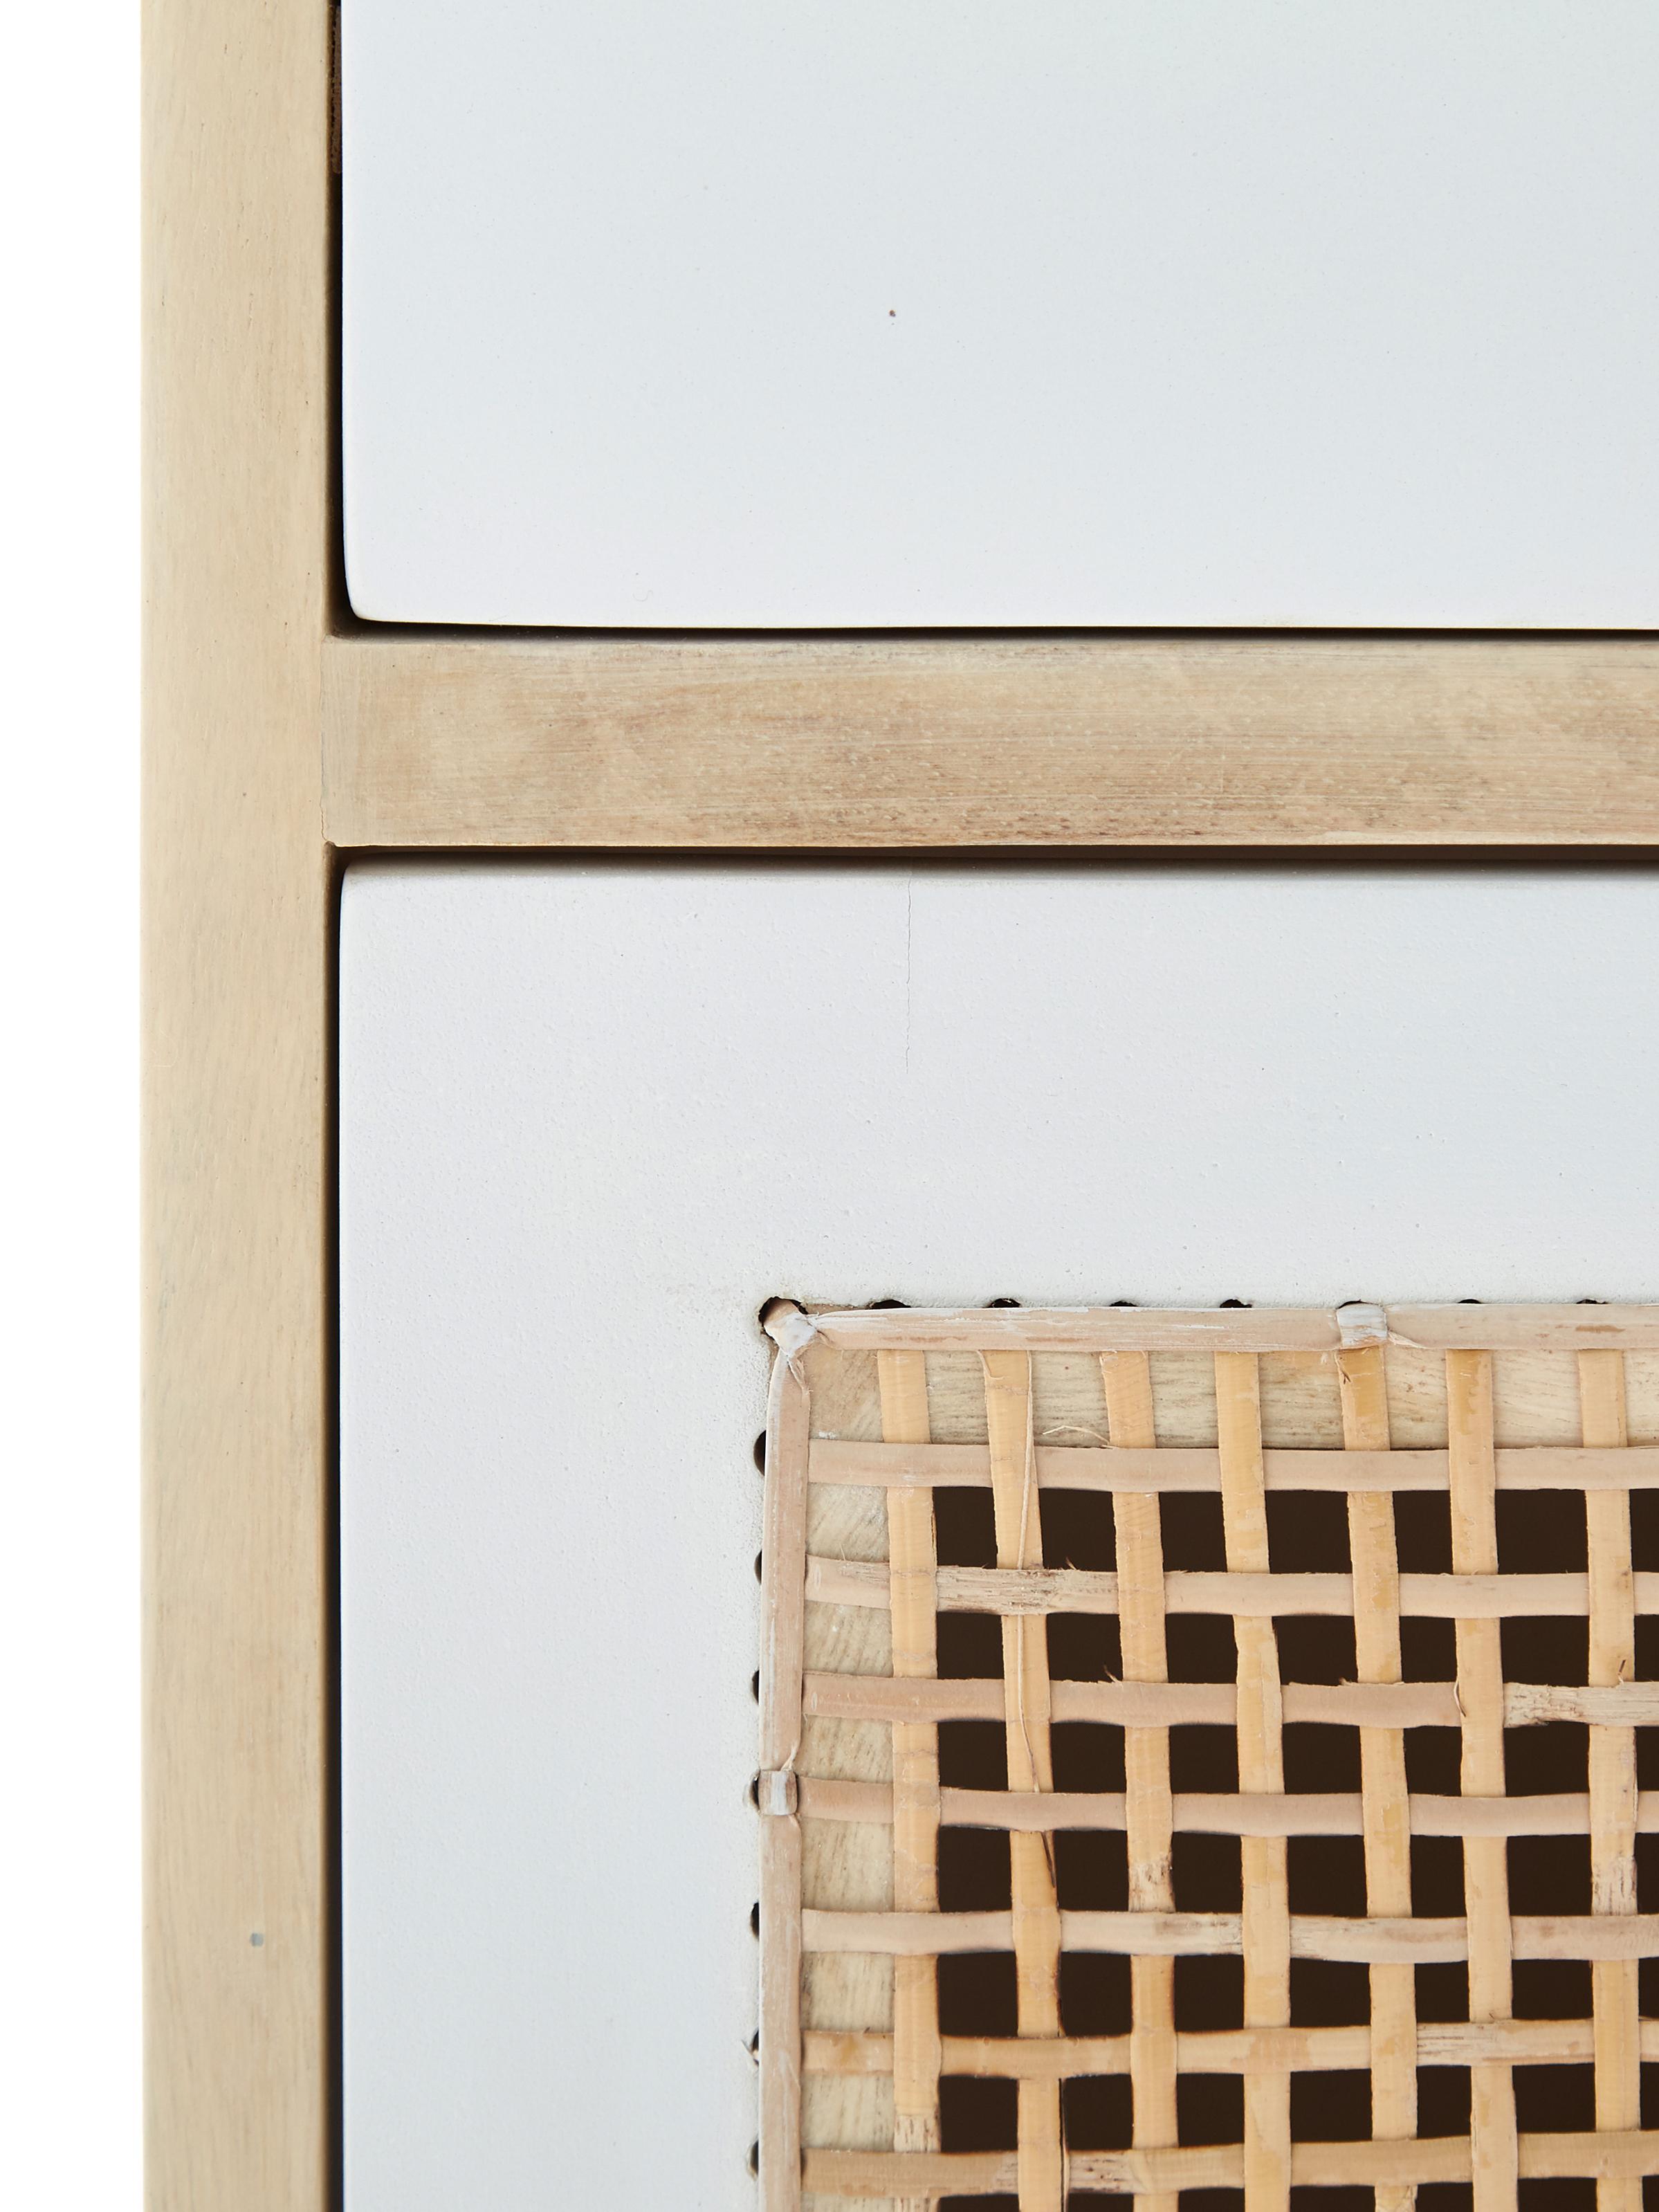 Nachttisch Georg, Korpus: Mangoholz, massiv, naturb, Mangoholz, Weiß, 40 x 60 cm